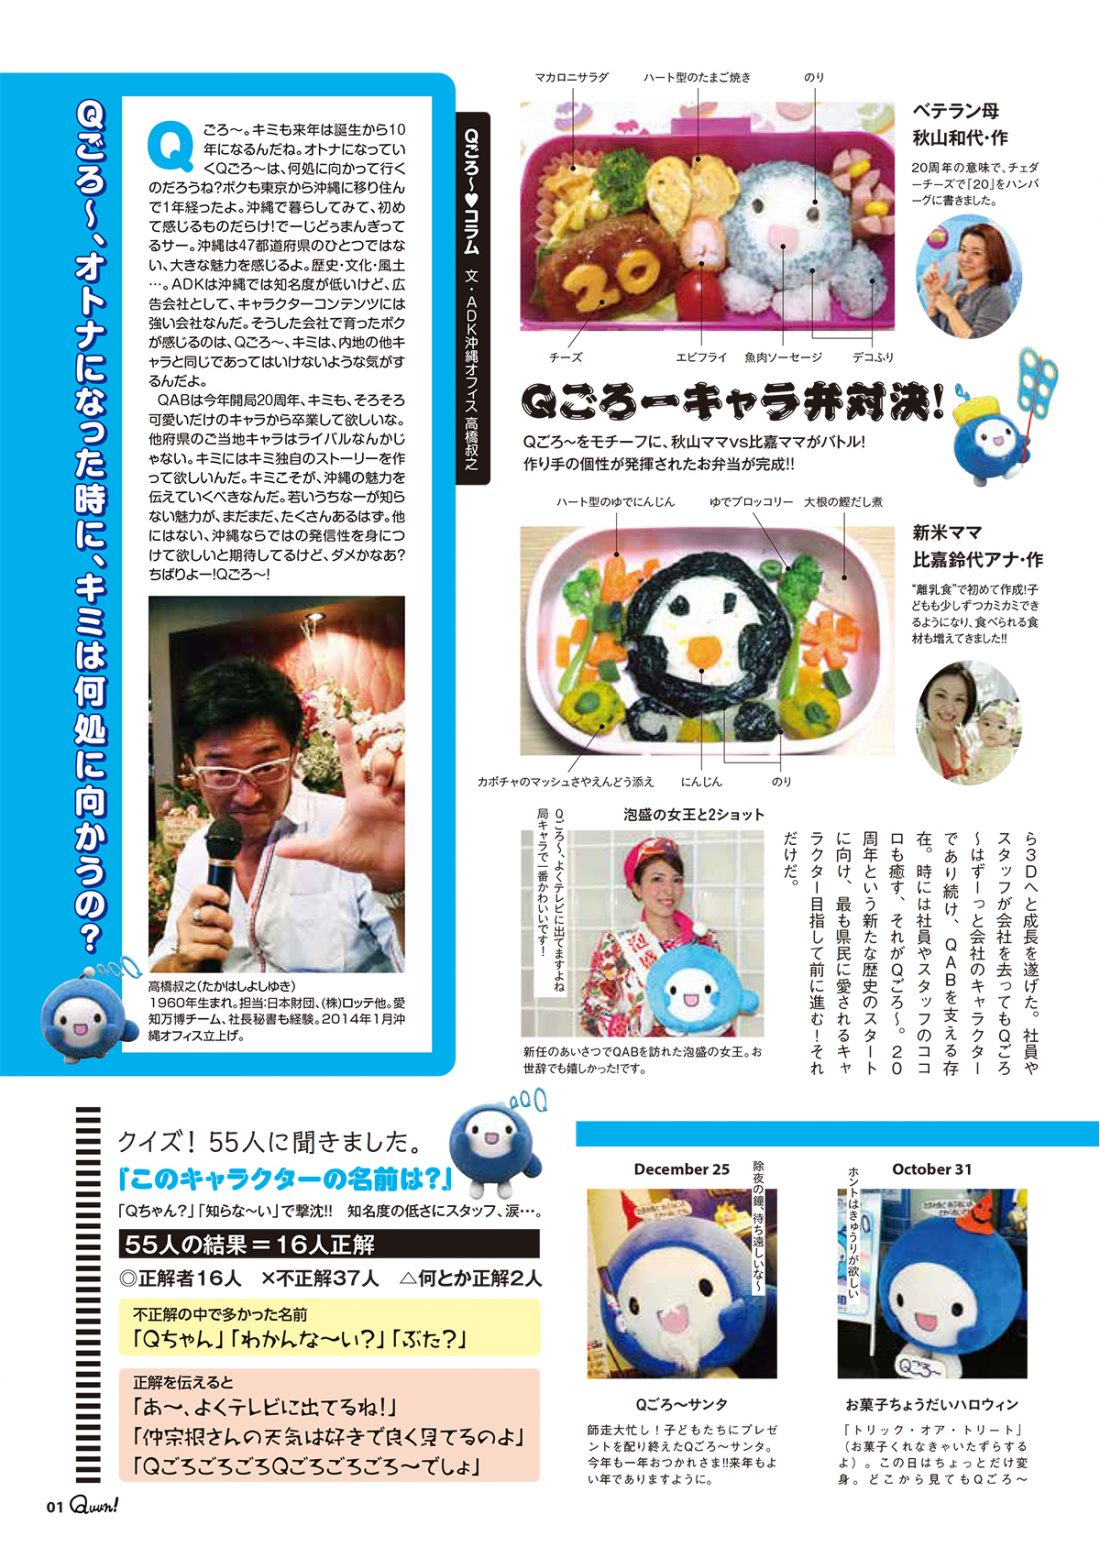 http://www.qab.co.jp/qgoro/wp-content/uploads/quun_0303-1100x1558.jpg